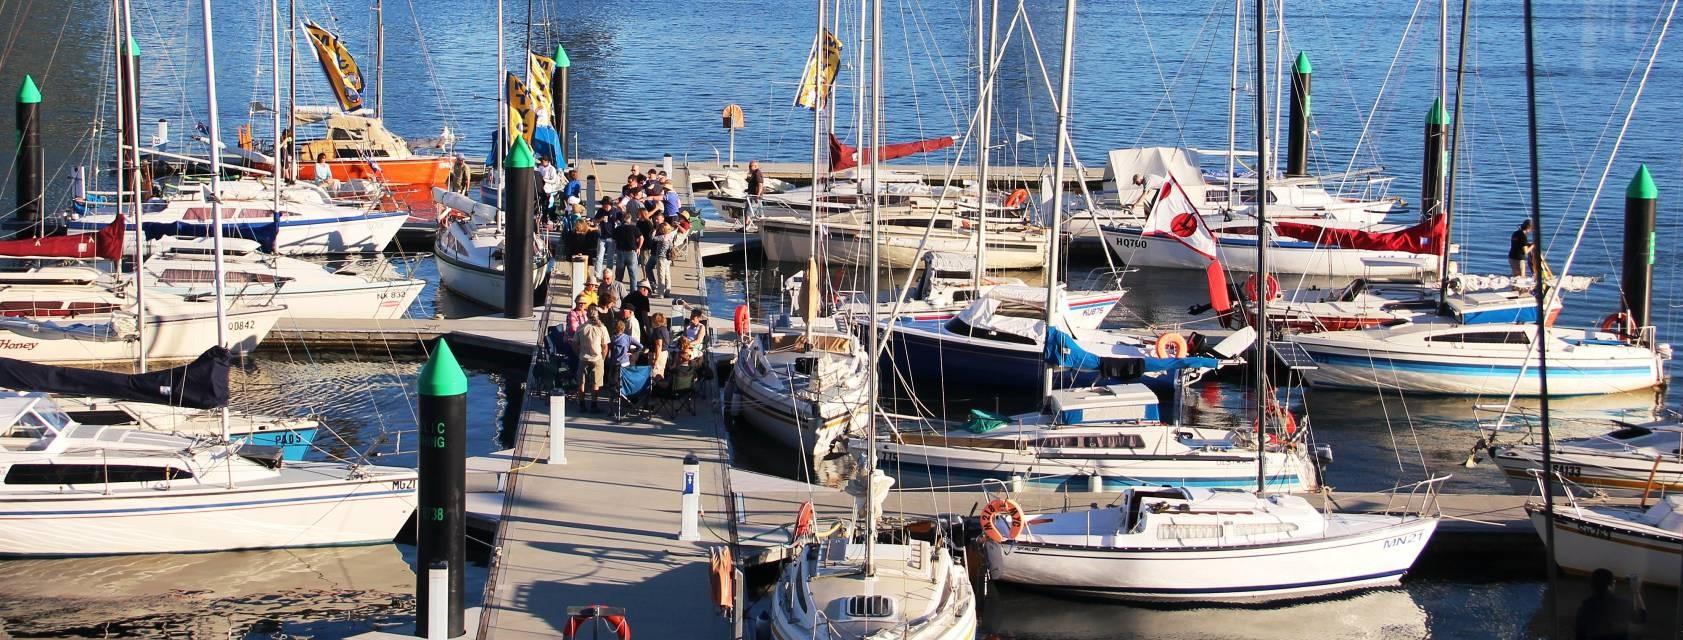 Trailable yacht season opener 2018.